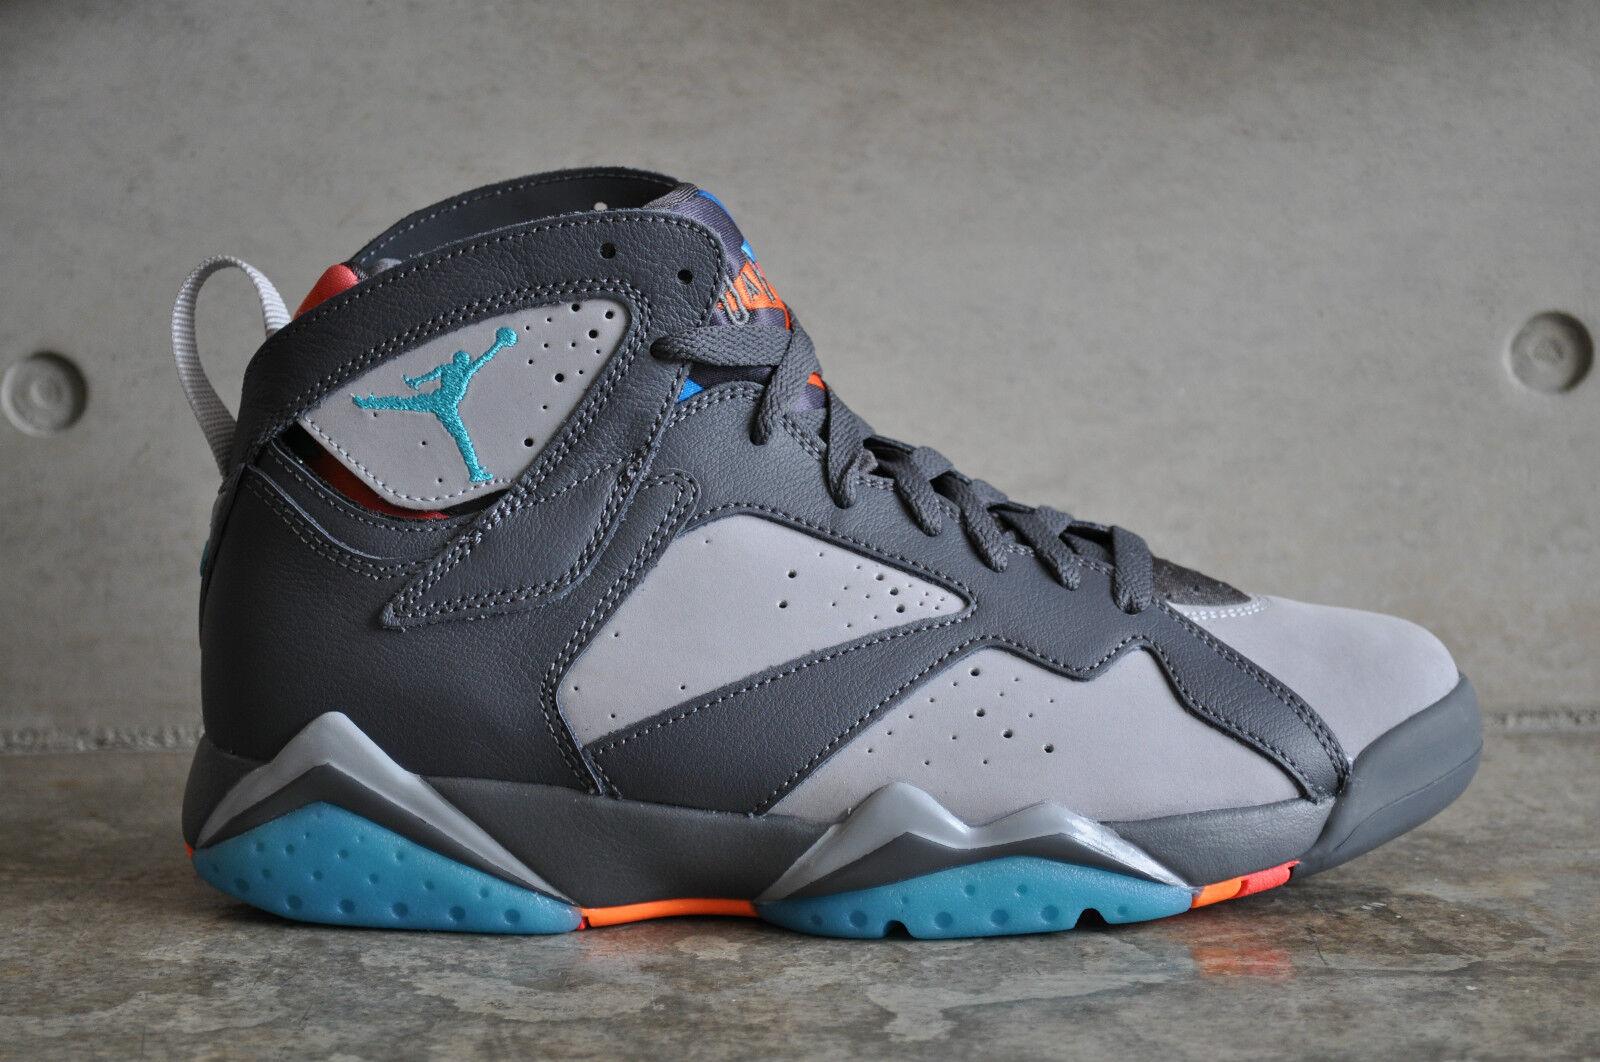 Nike Air Jordan 7 Retro  Barcelona Days  - Dark Grey Wolf Grey-bluee